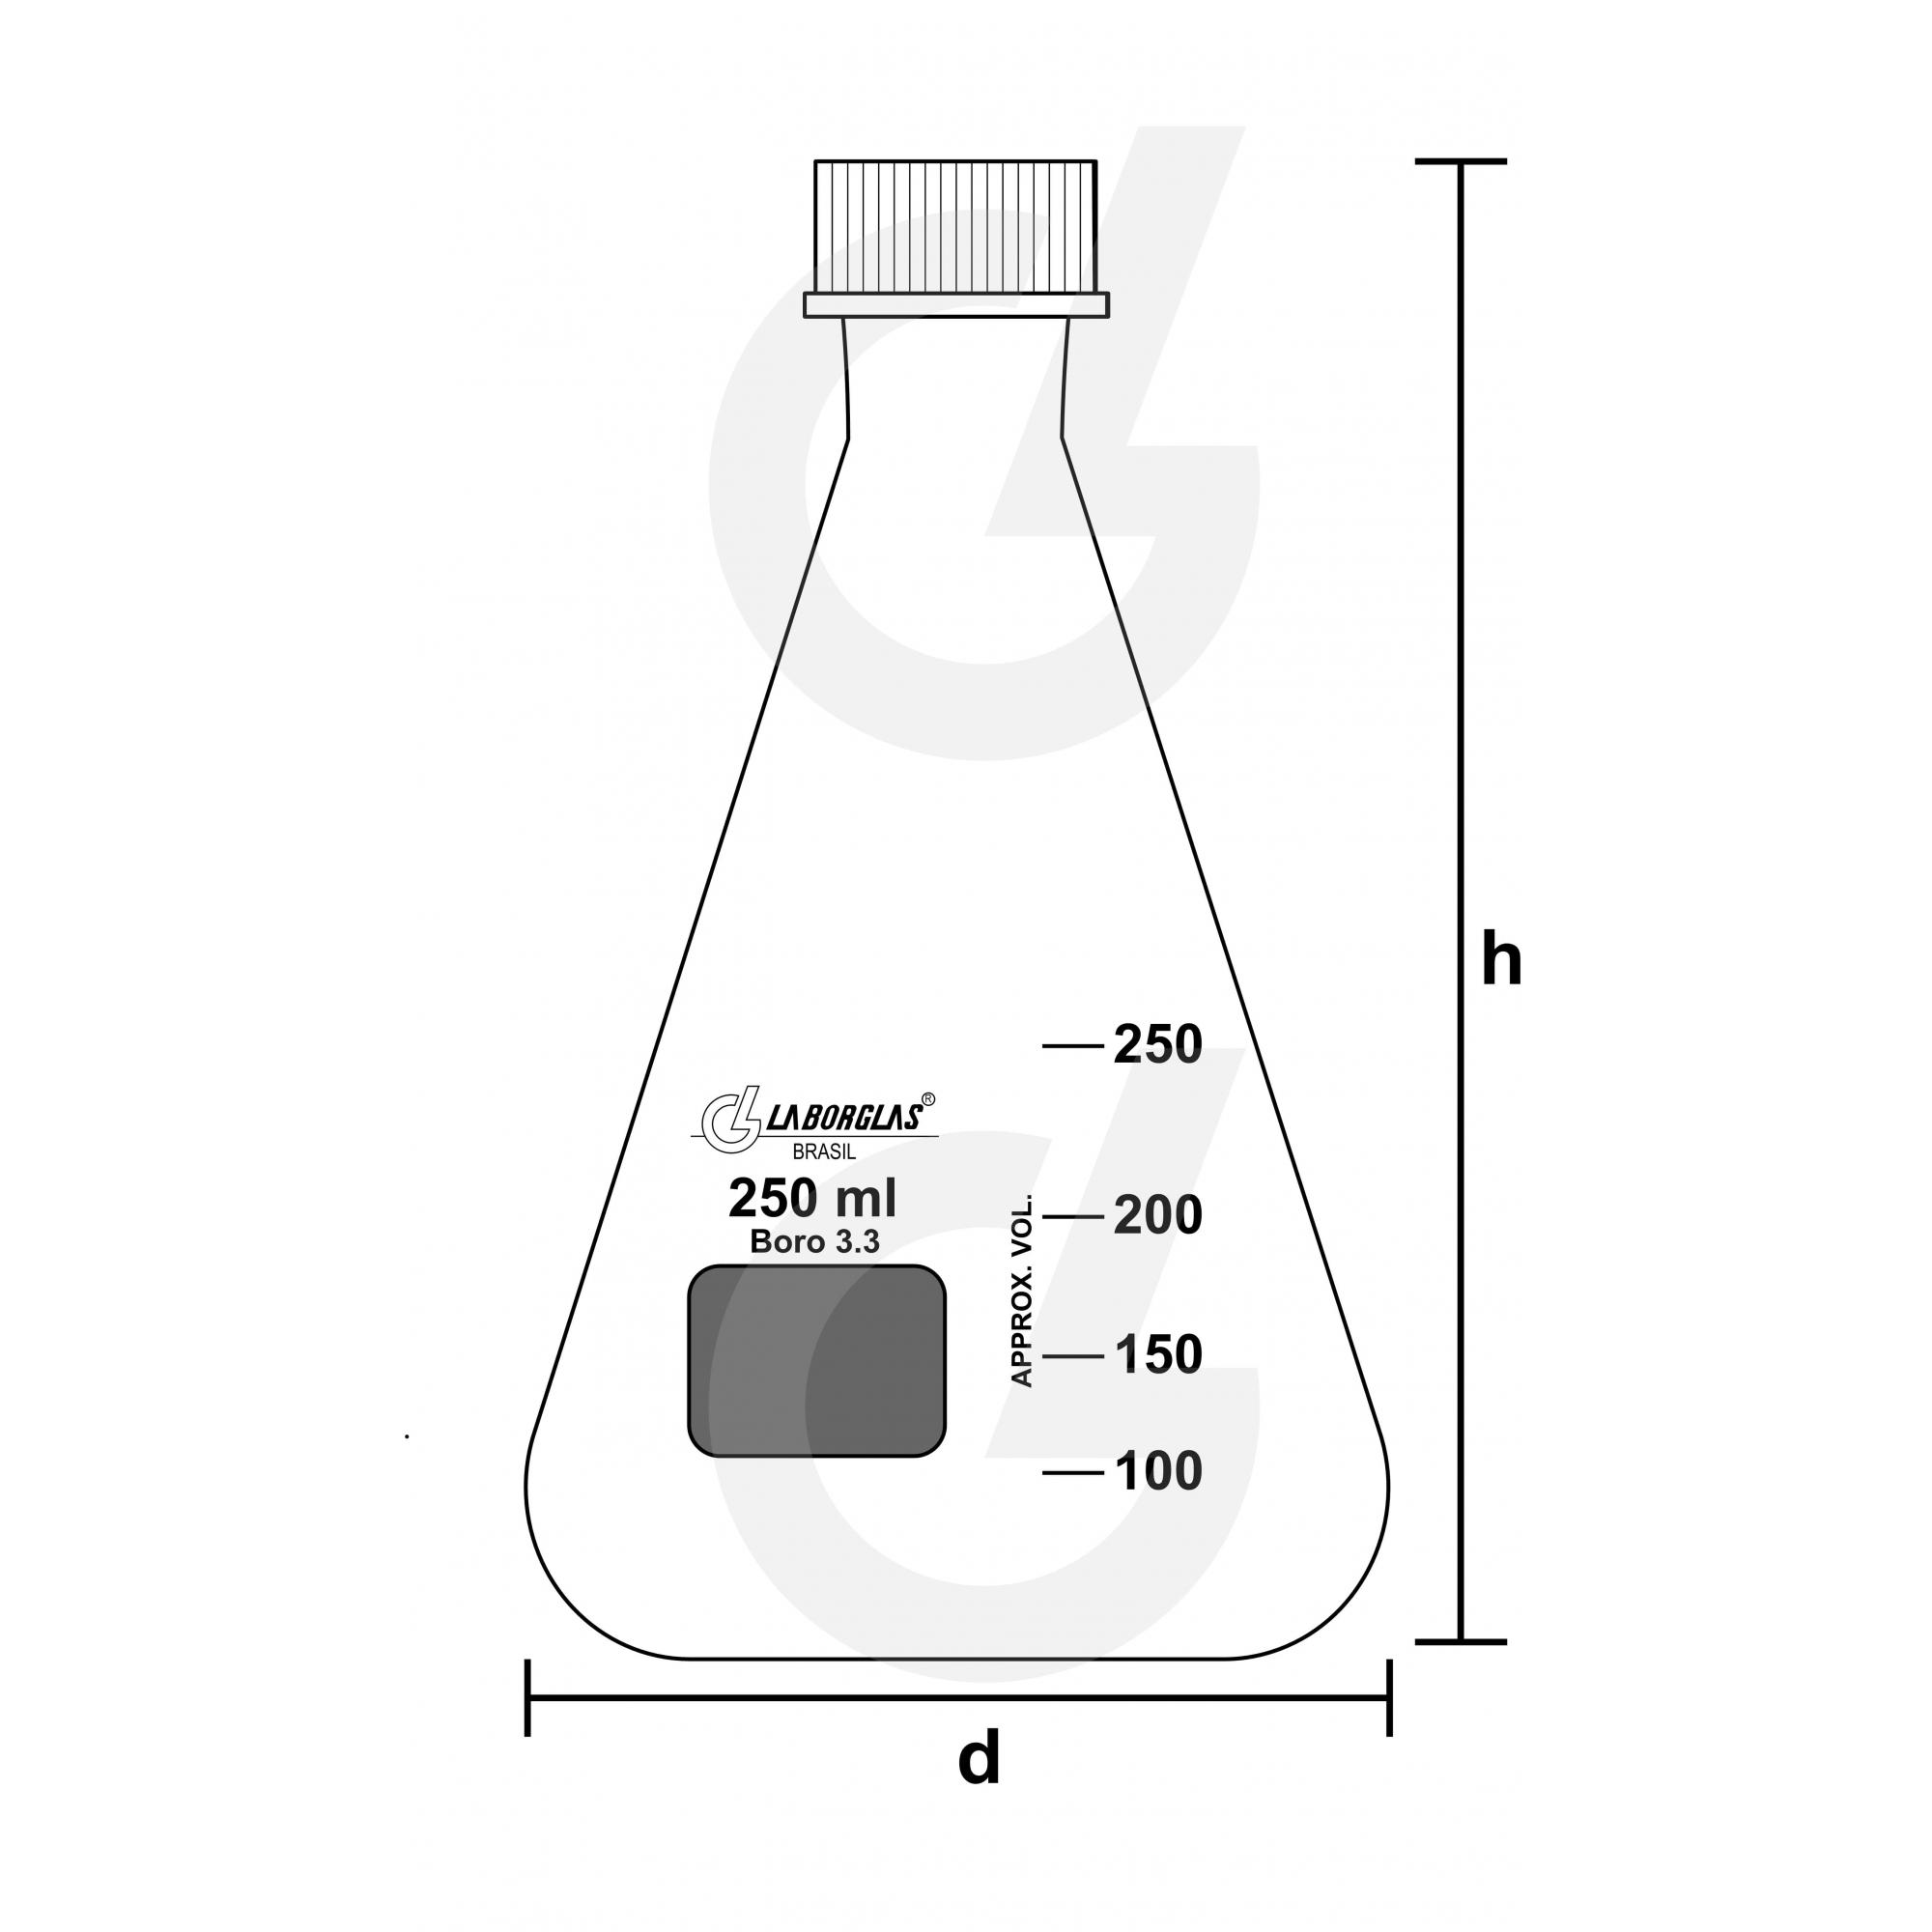 FRASCO ERLENMEYER C/ TAMPA DE ROSCA 100 ML - Laborglas - Cód. 91216284